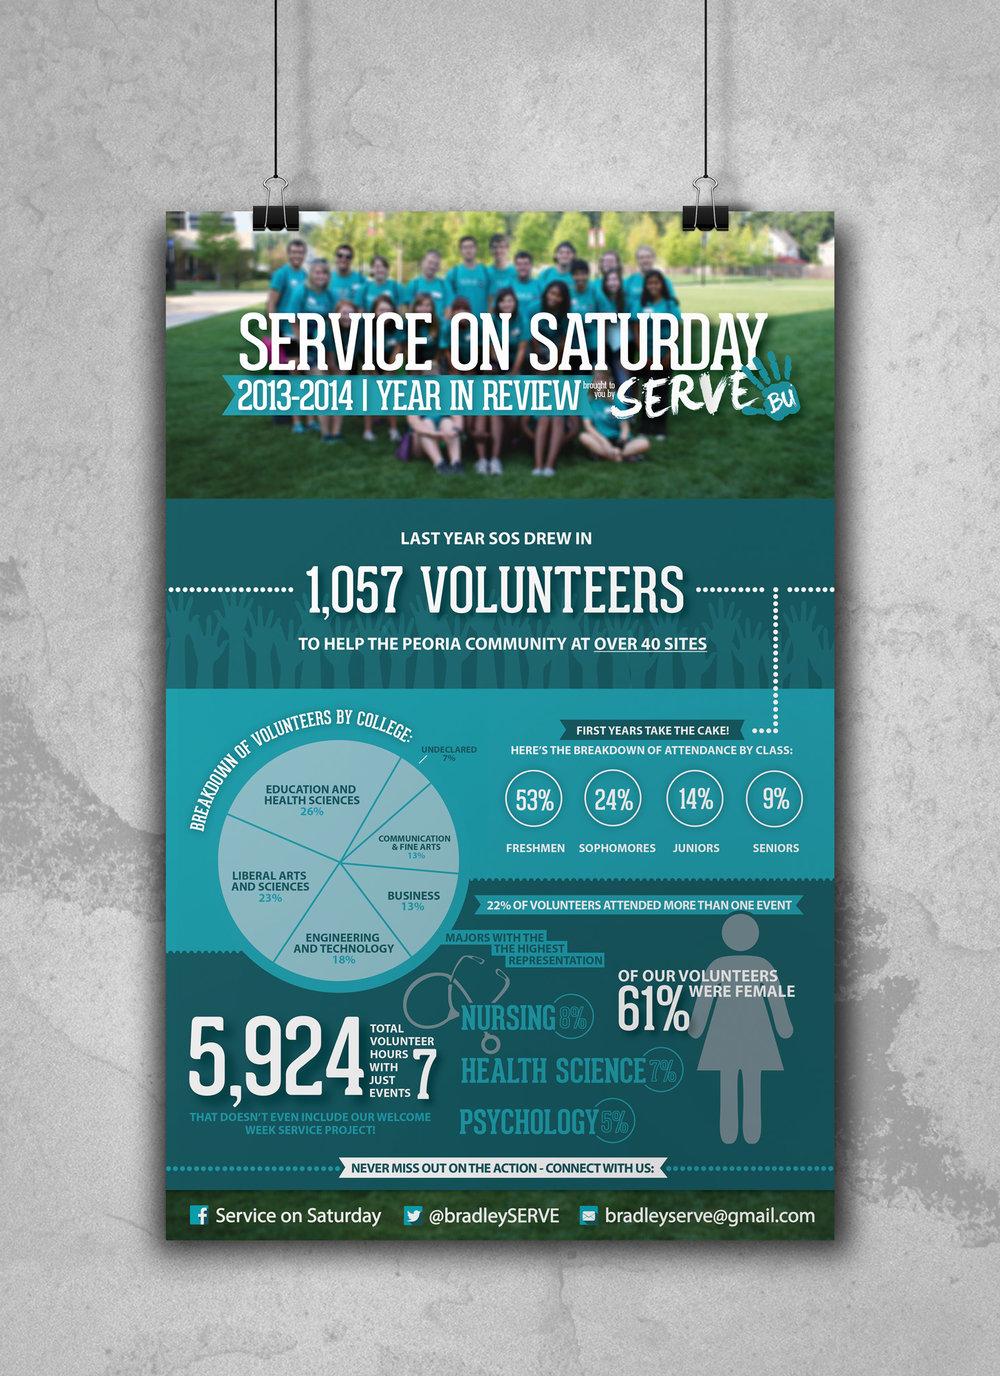 SERVE_Infographic-Mockup.jpg